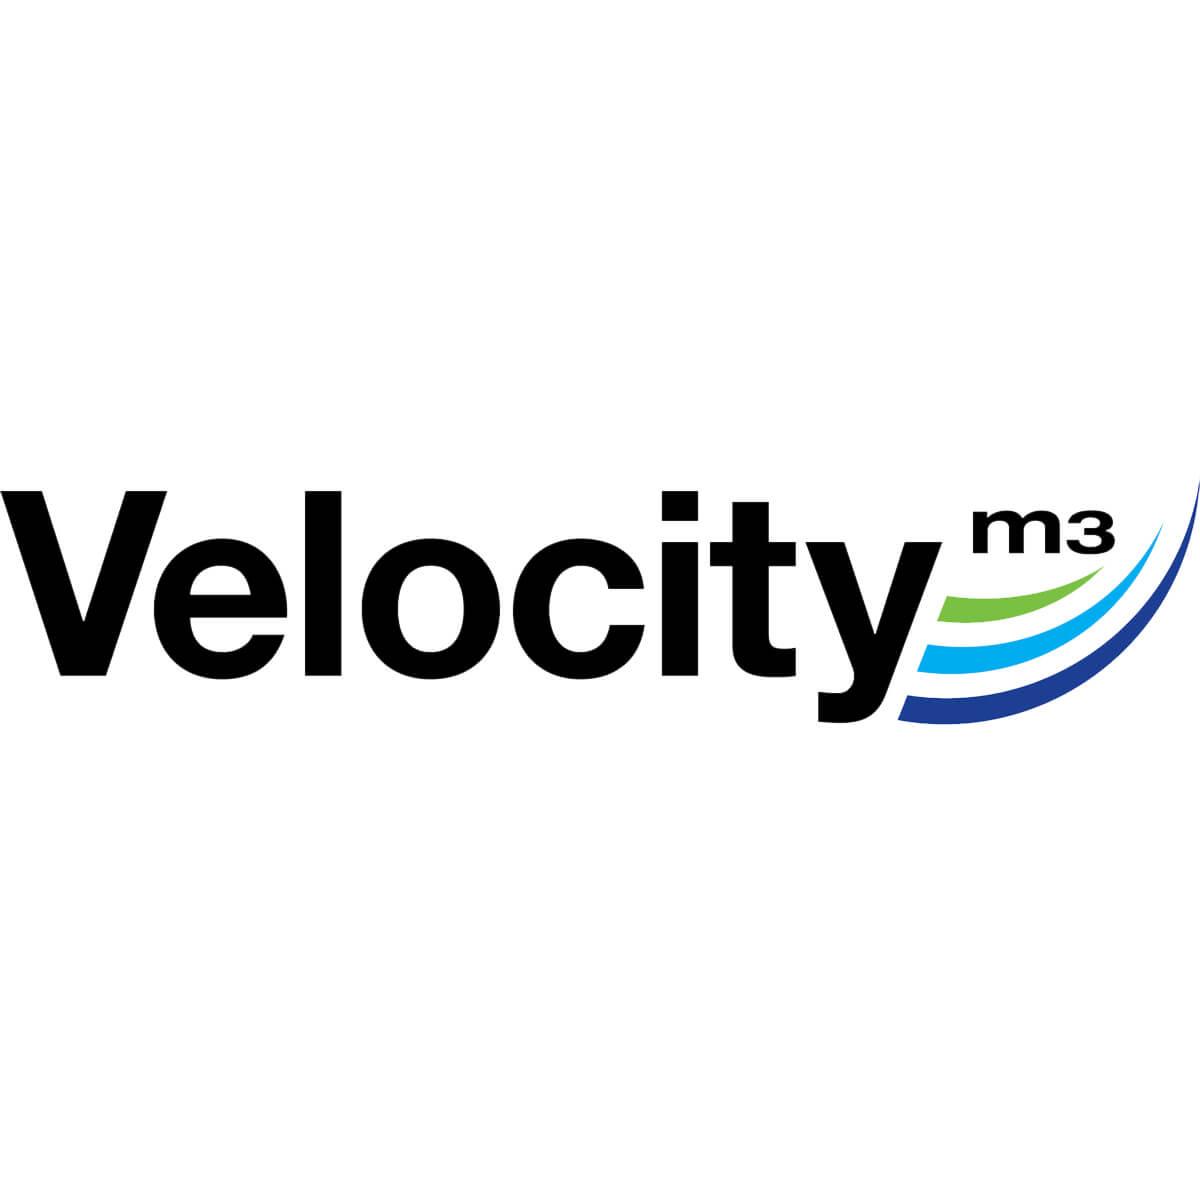 Velocity m3 8.1L